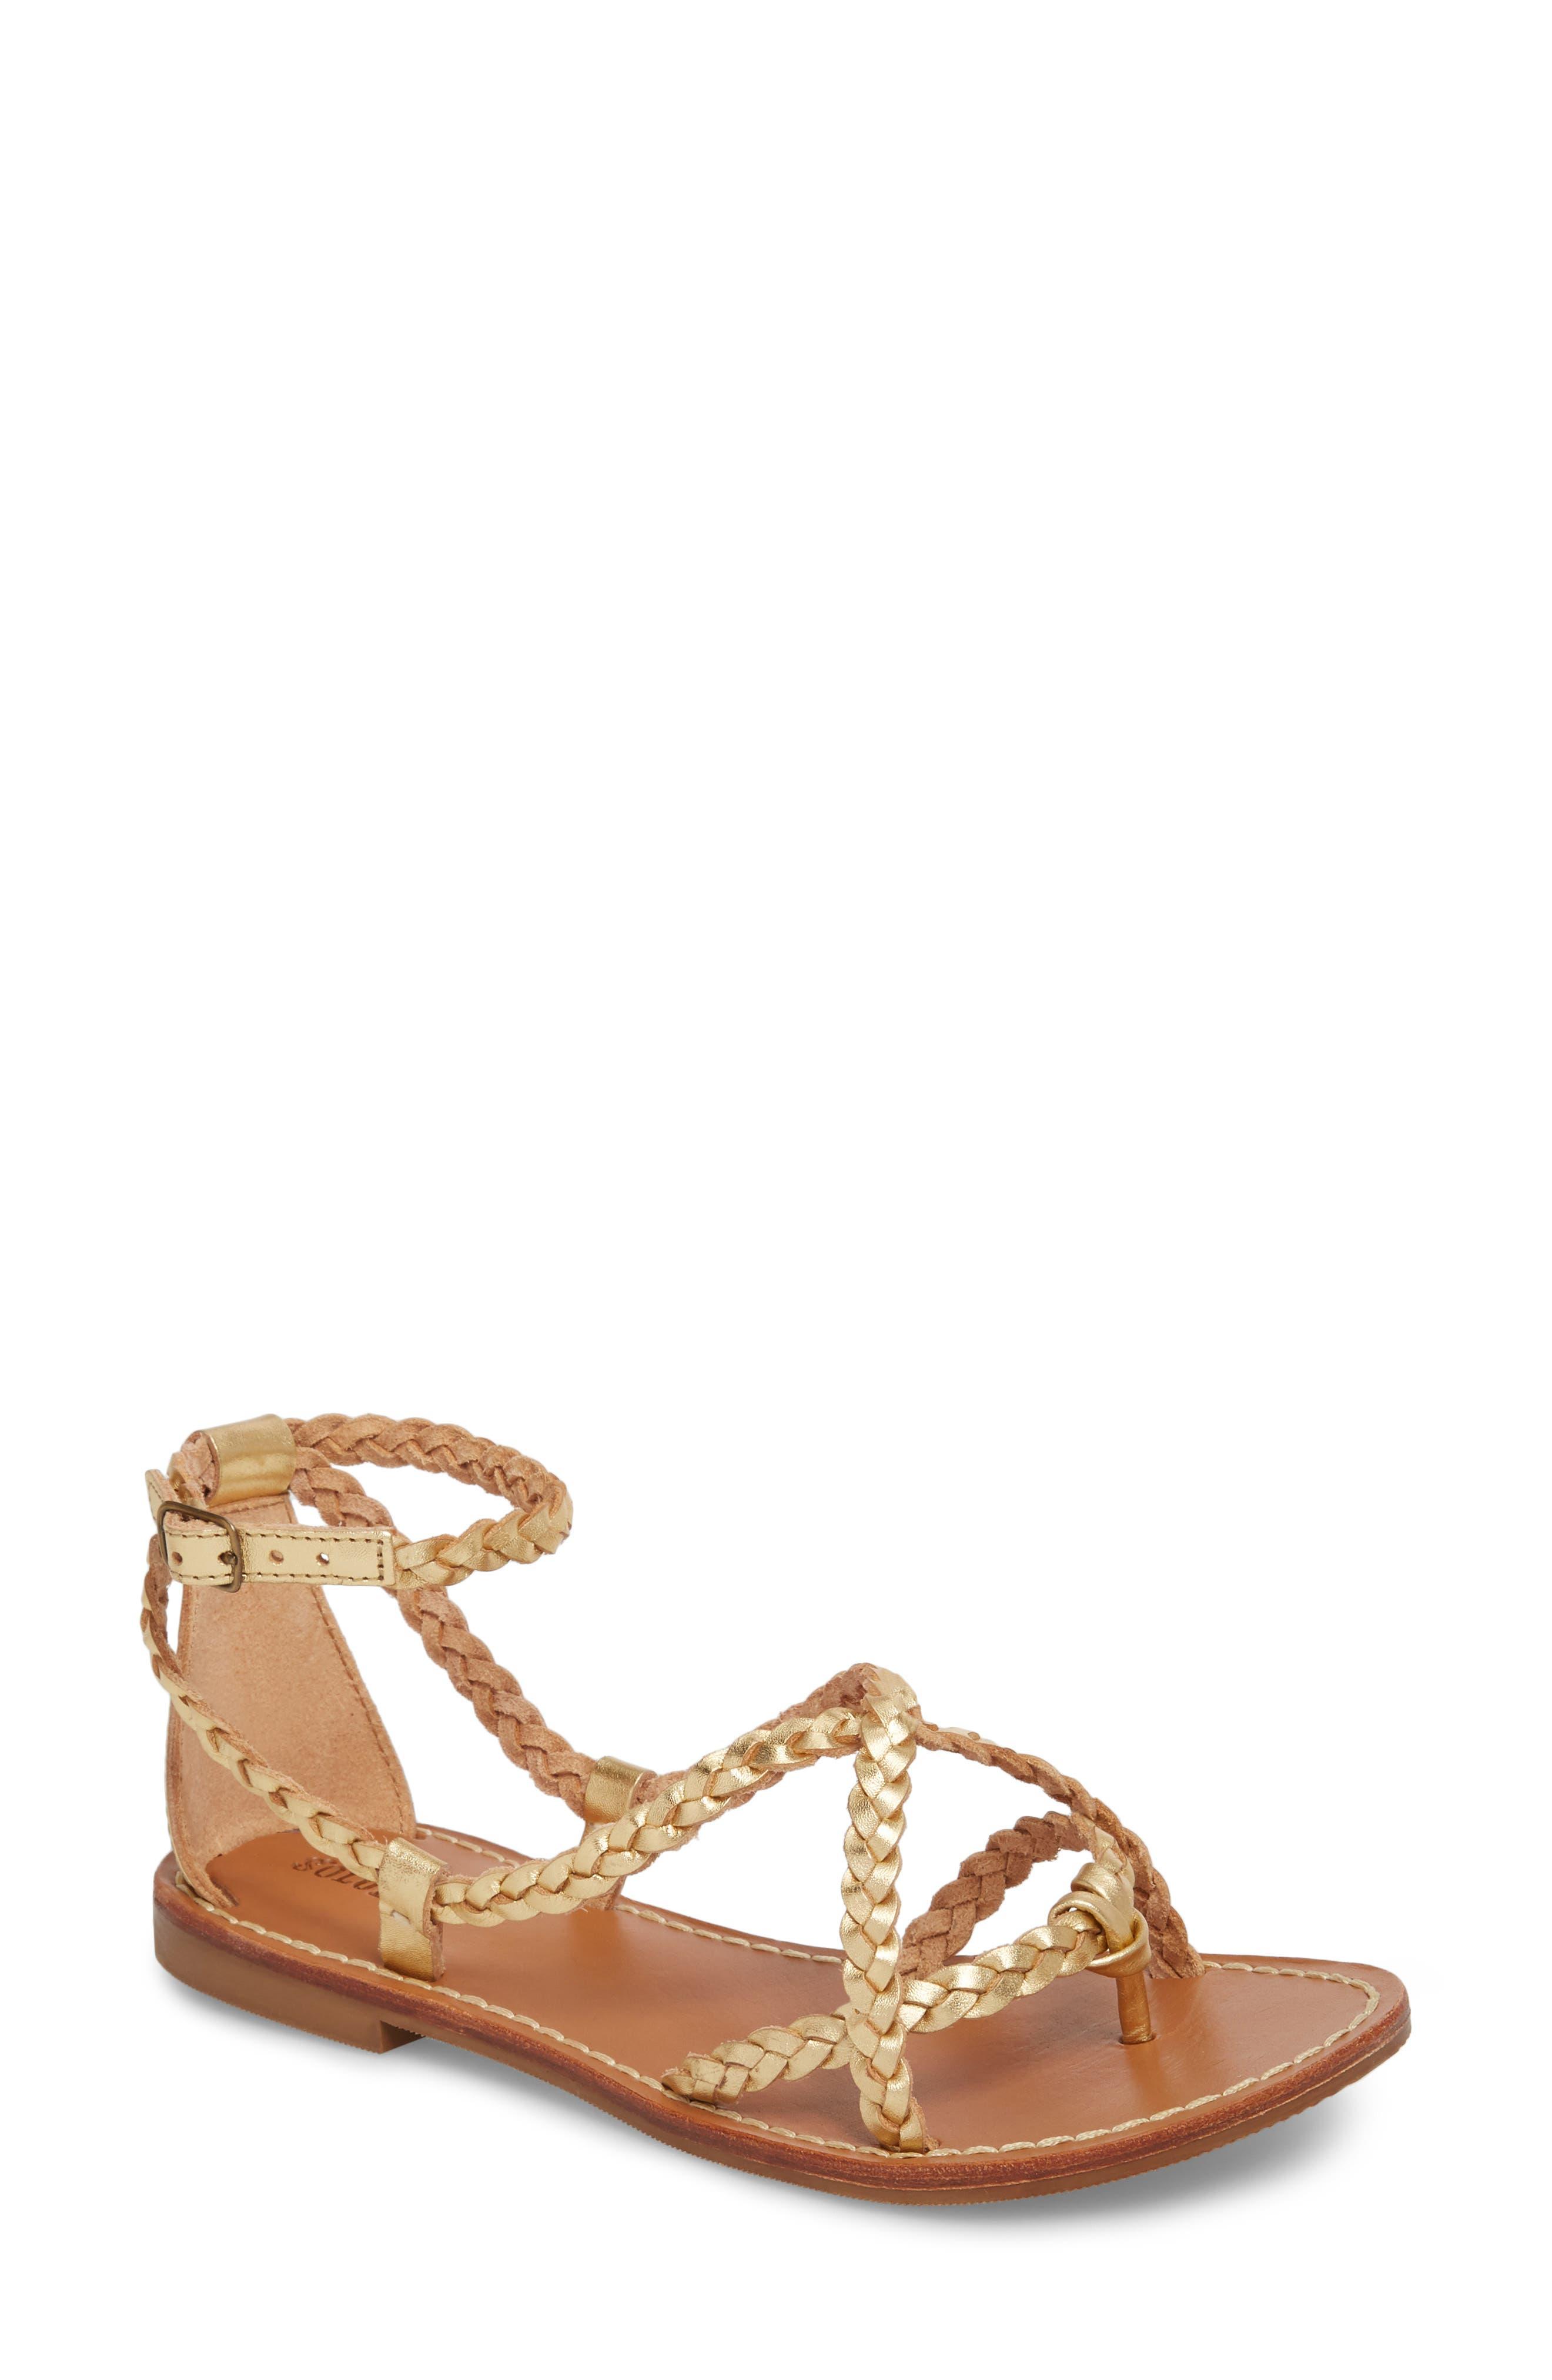 Amalfi Braided Metallic Sandal,                             Main thumbnail 1, color,                             Gold Leather